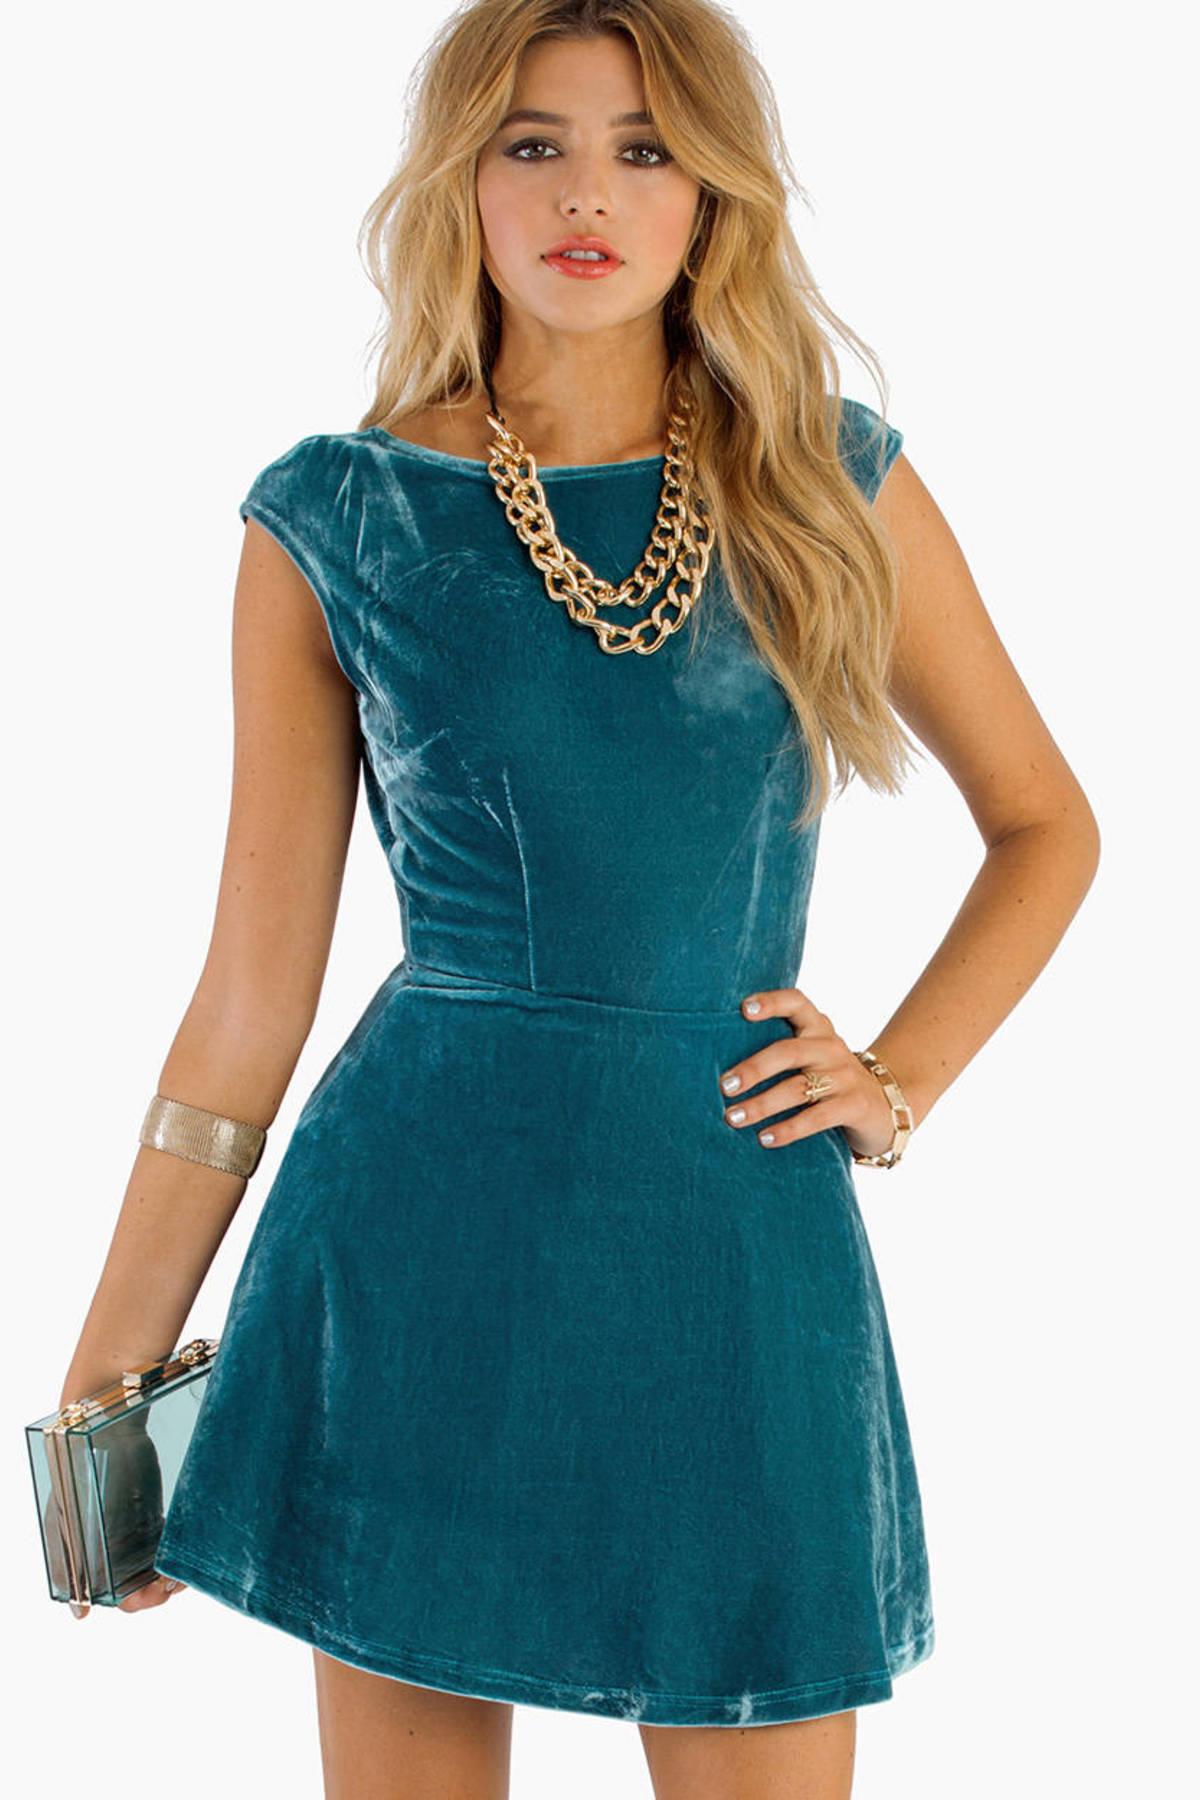 Teal Skater Dress - Blue Dress - Sleeveless Dress - $14.00